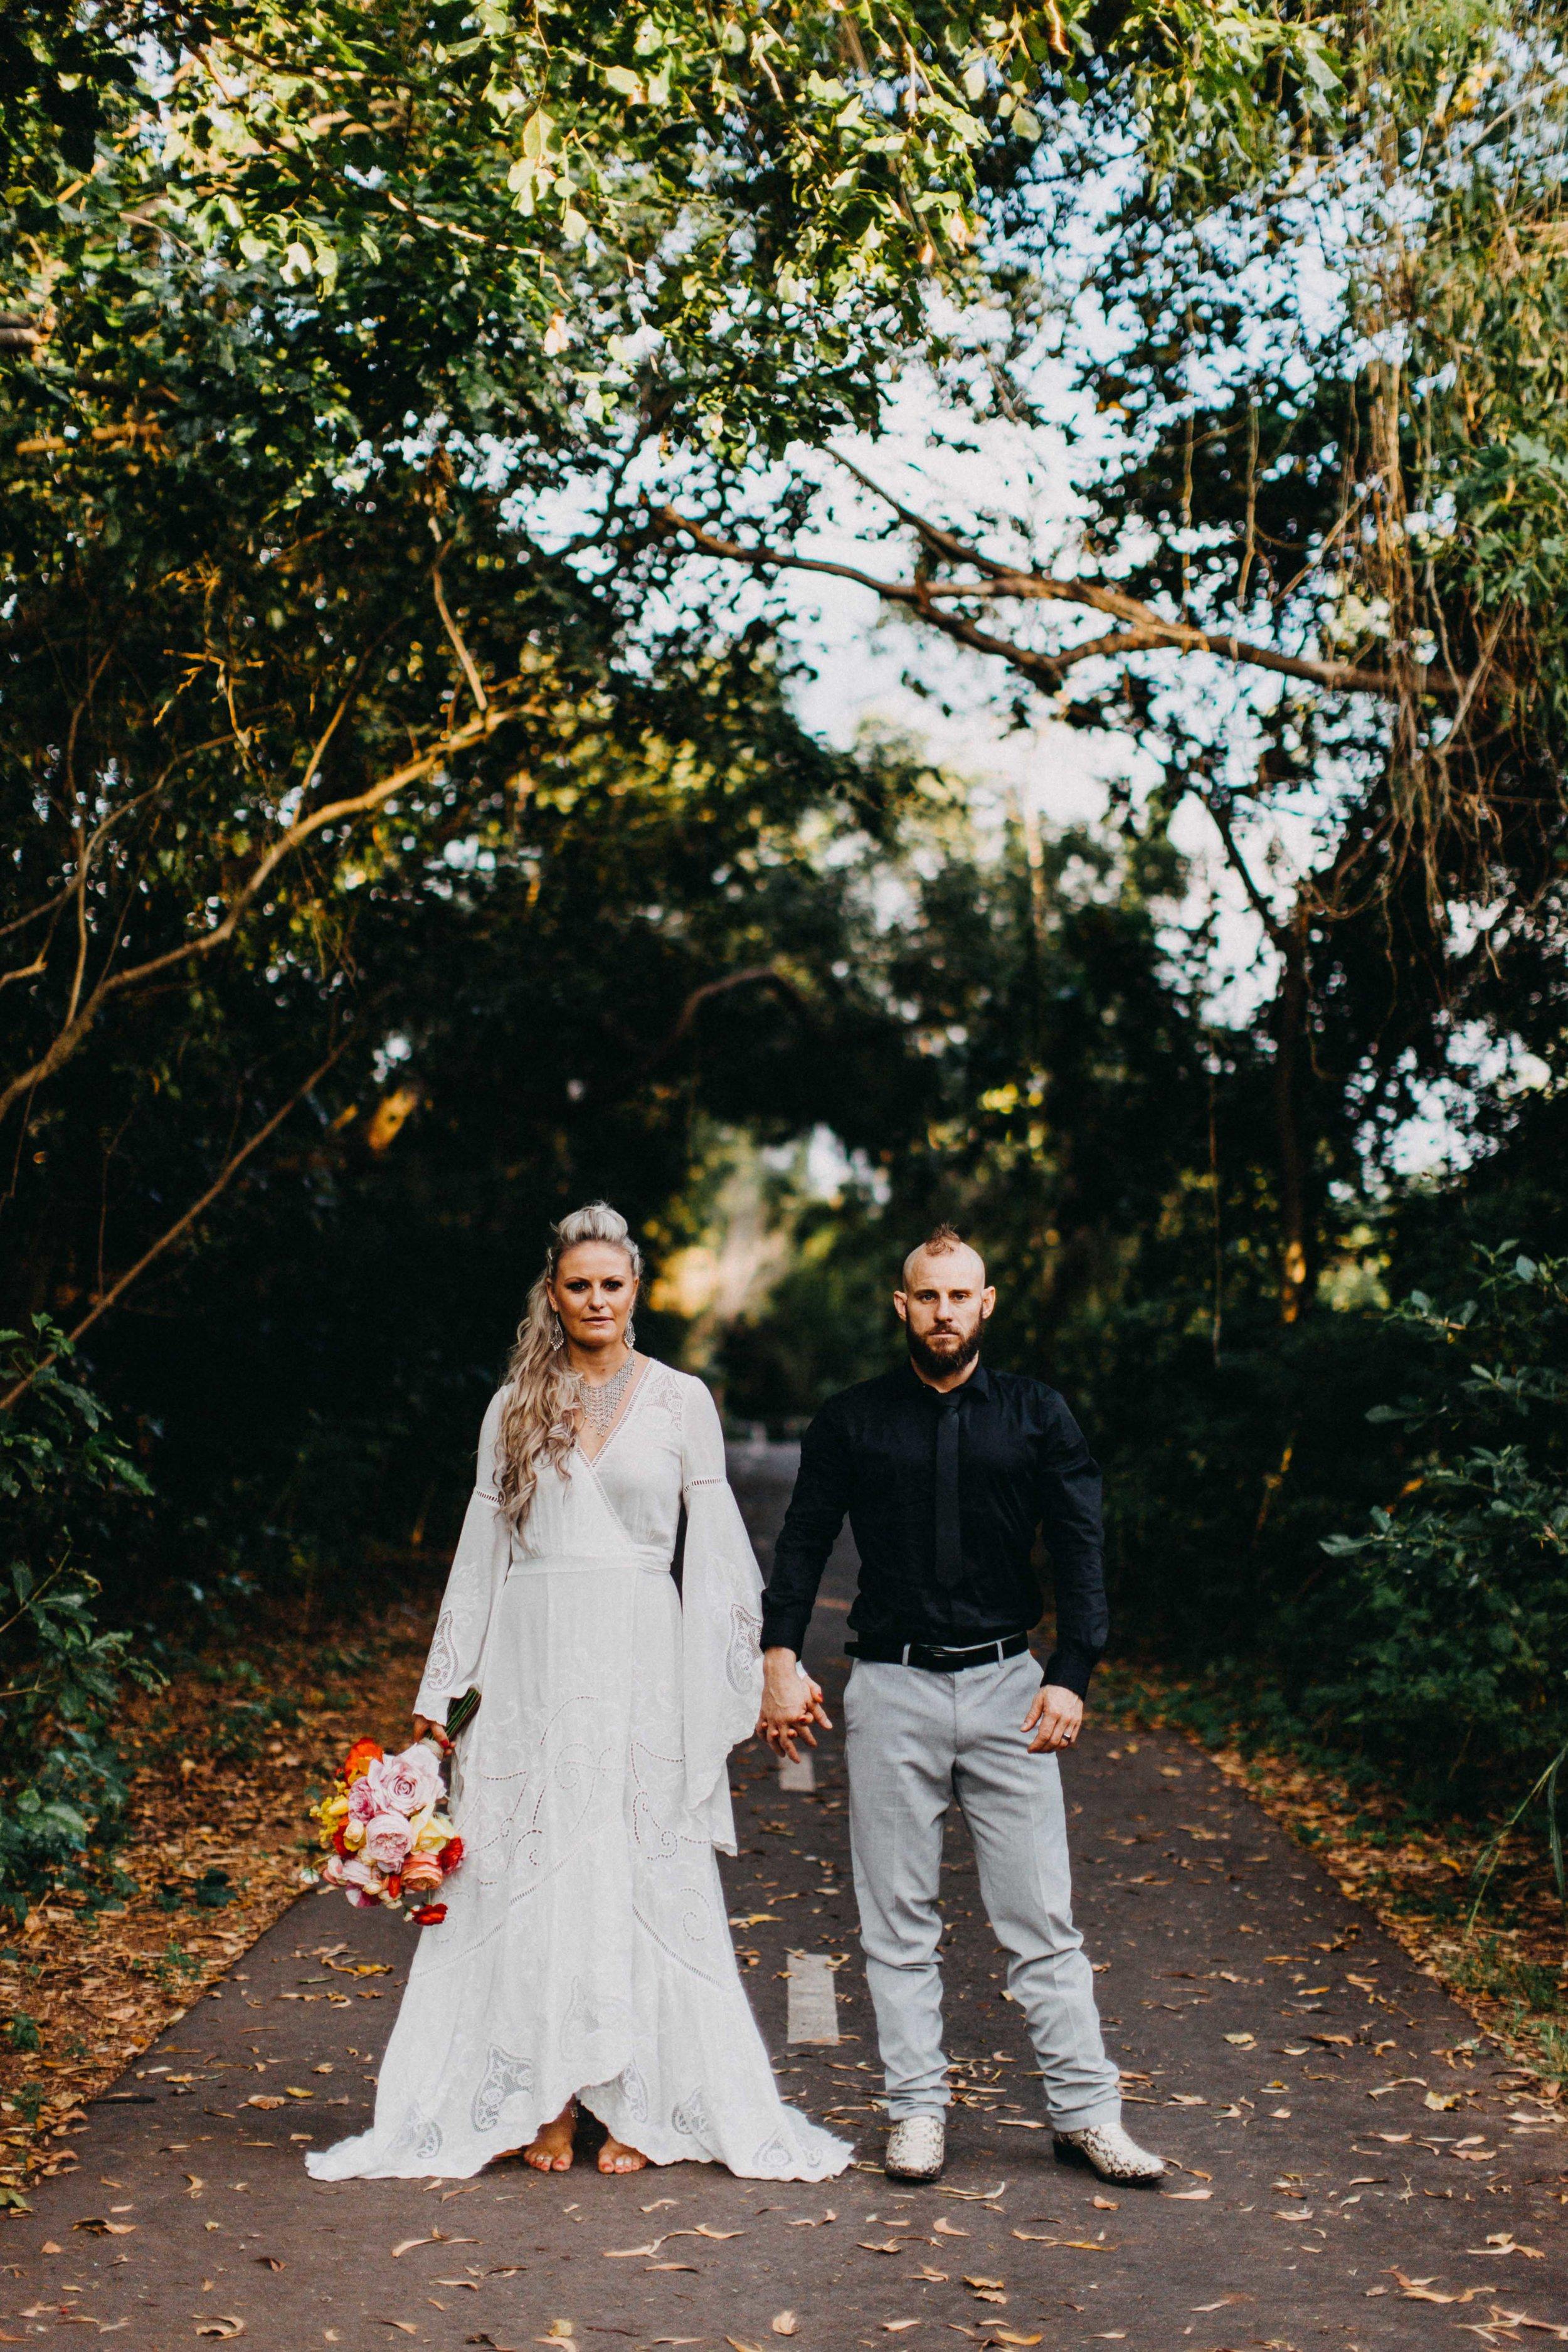 darwin-elopement-wedding-beach-camden-photography-www.emilyobrienphotography.net-57.jpg